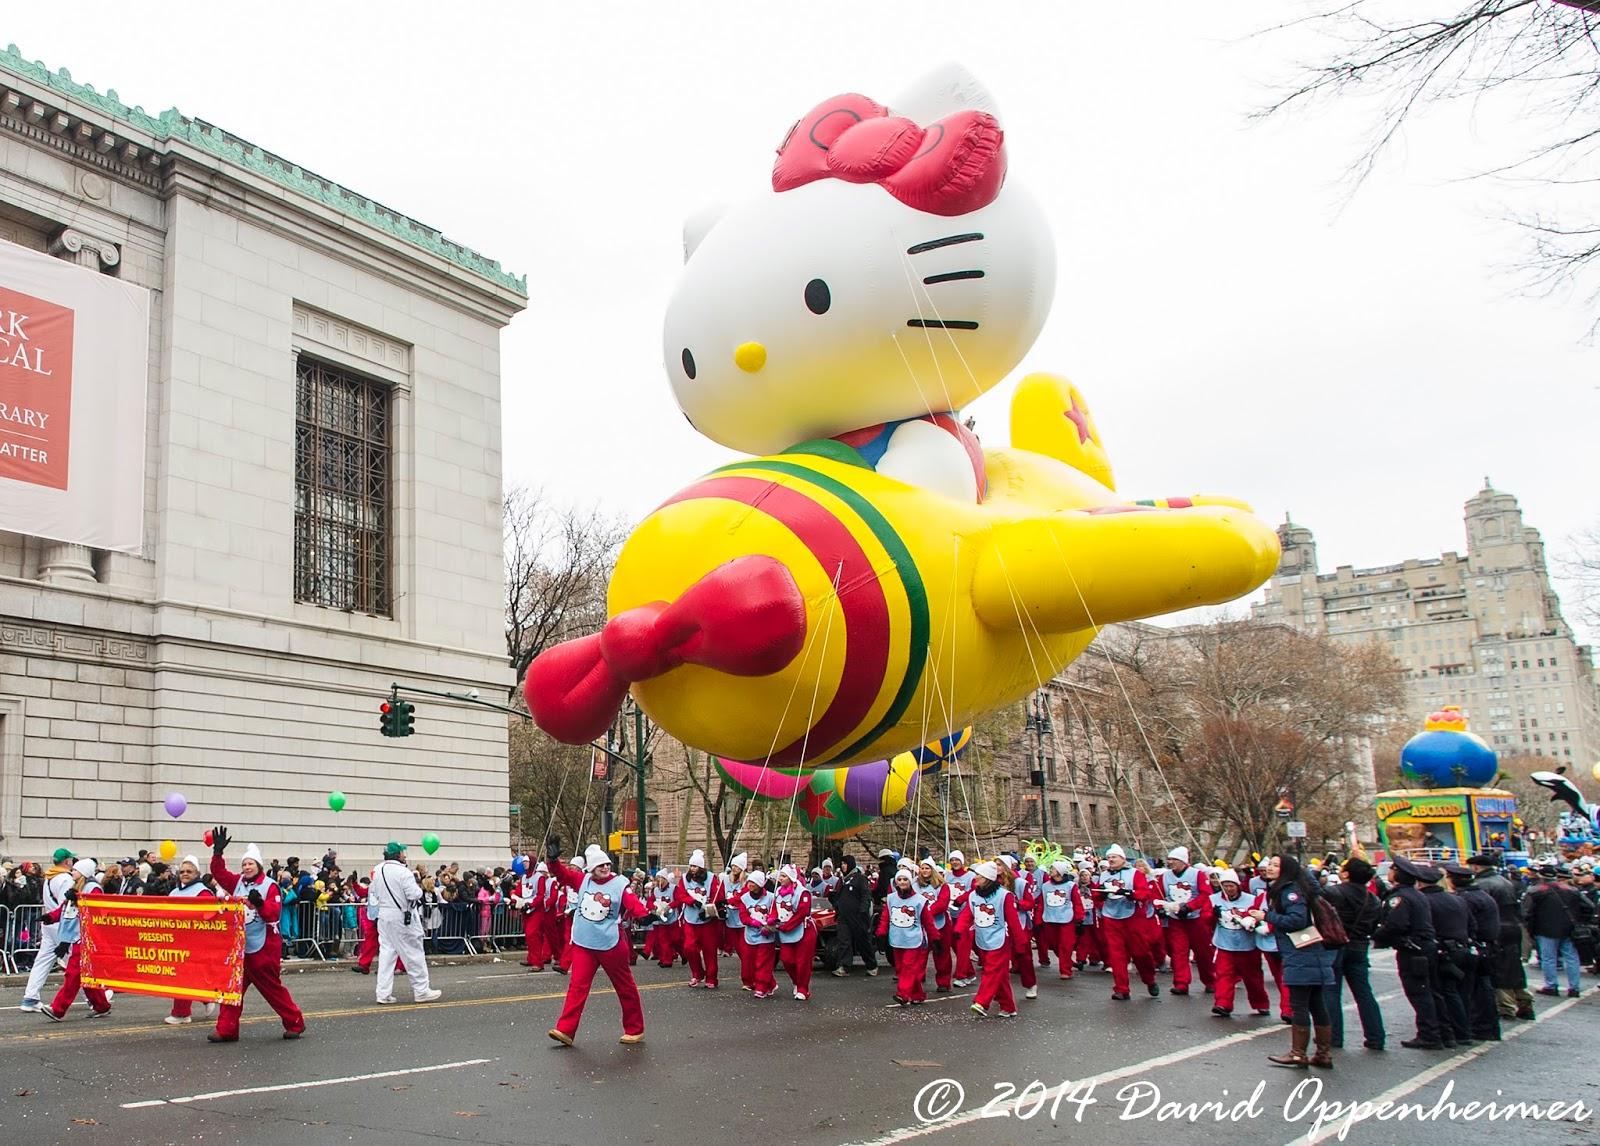 Hello Kitty by Sanrio Inc.